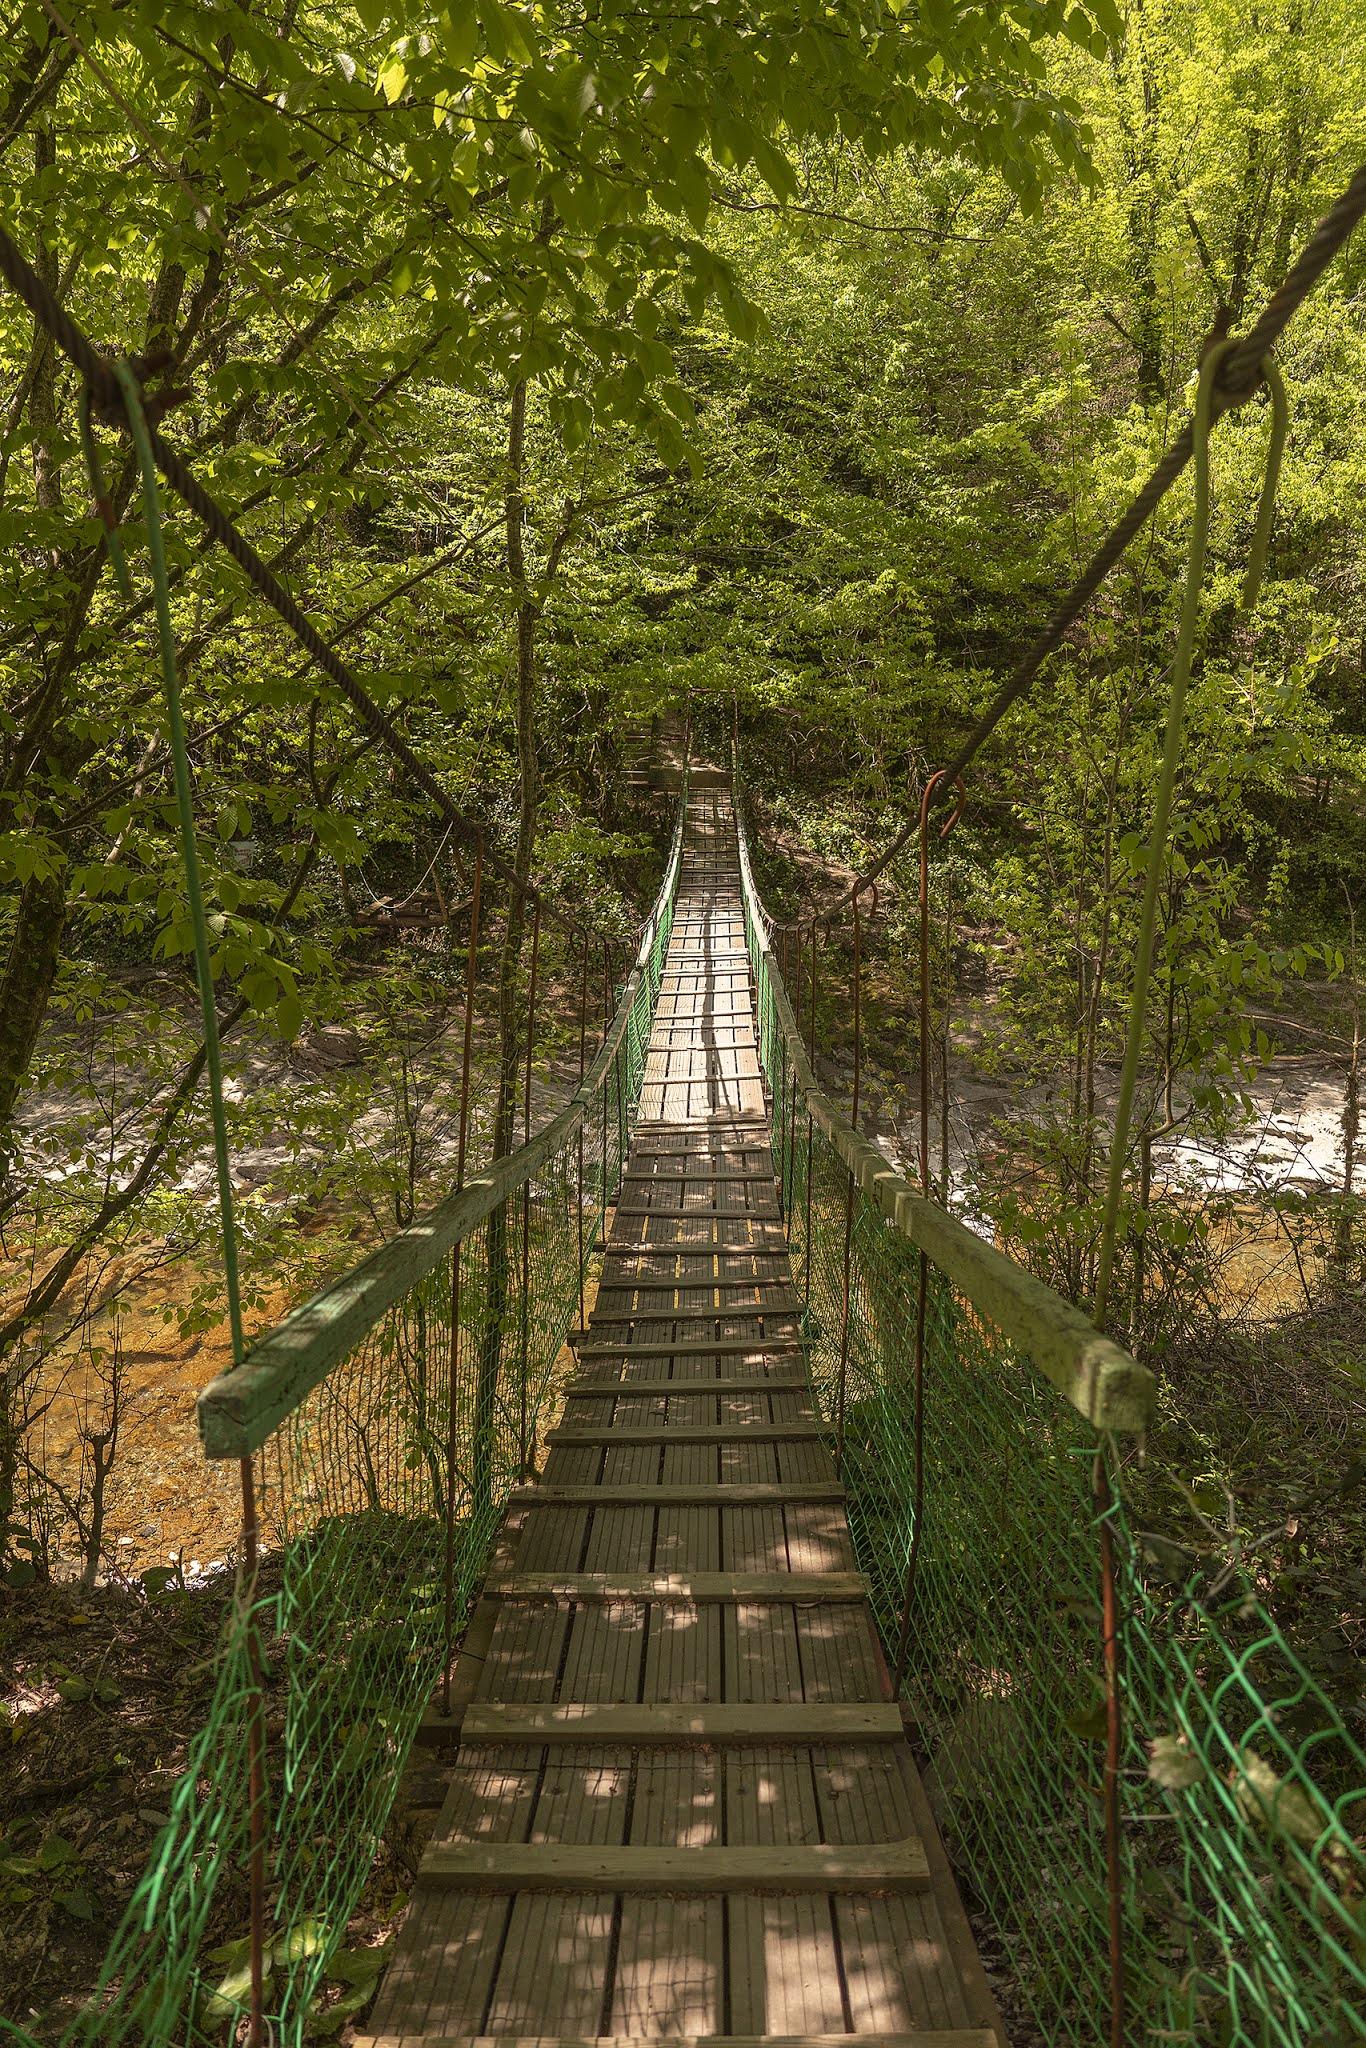 photo Igor Novik suspended bridge jnugli Sochi Dagomys forest mountain stream summer green foliage